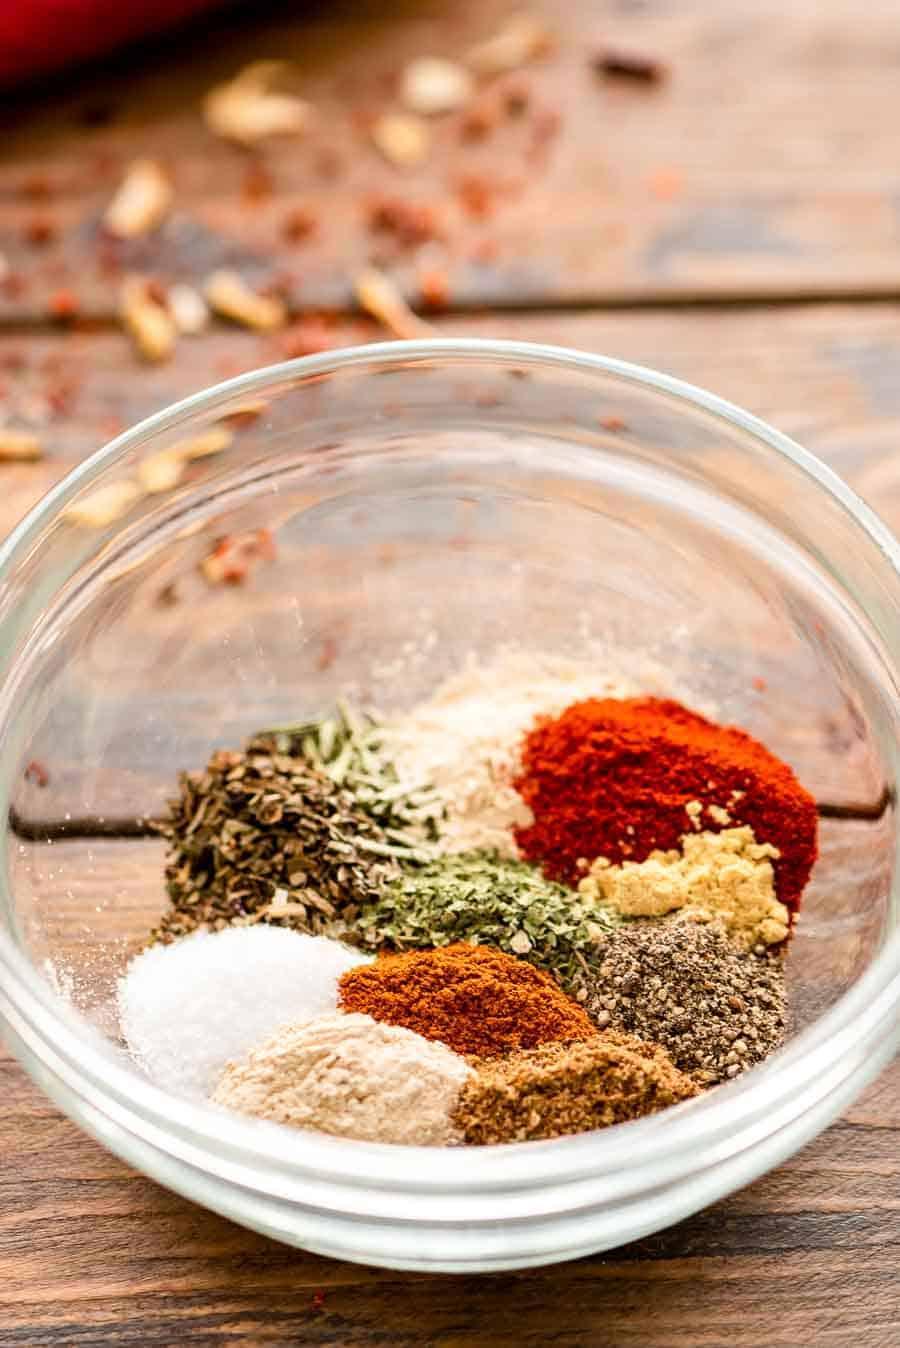 Ingredients of Chicken Seasoning unmixed in bowl